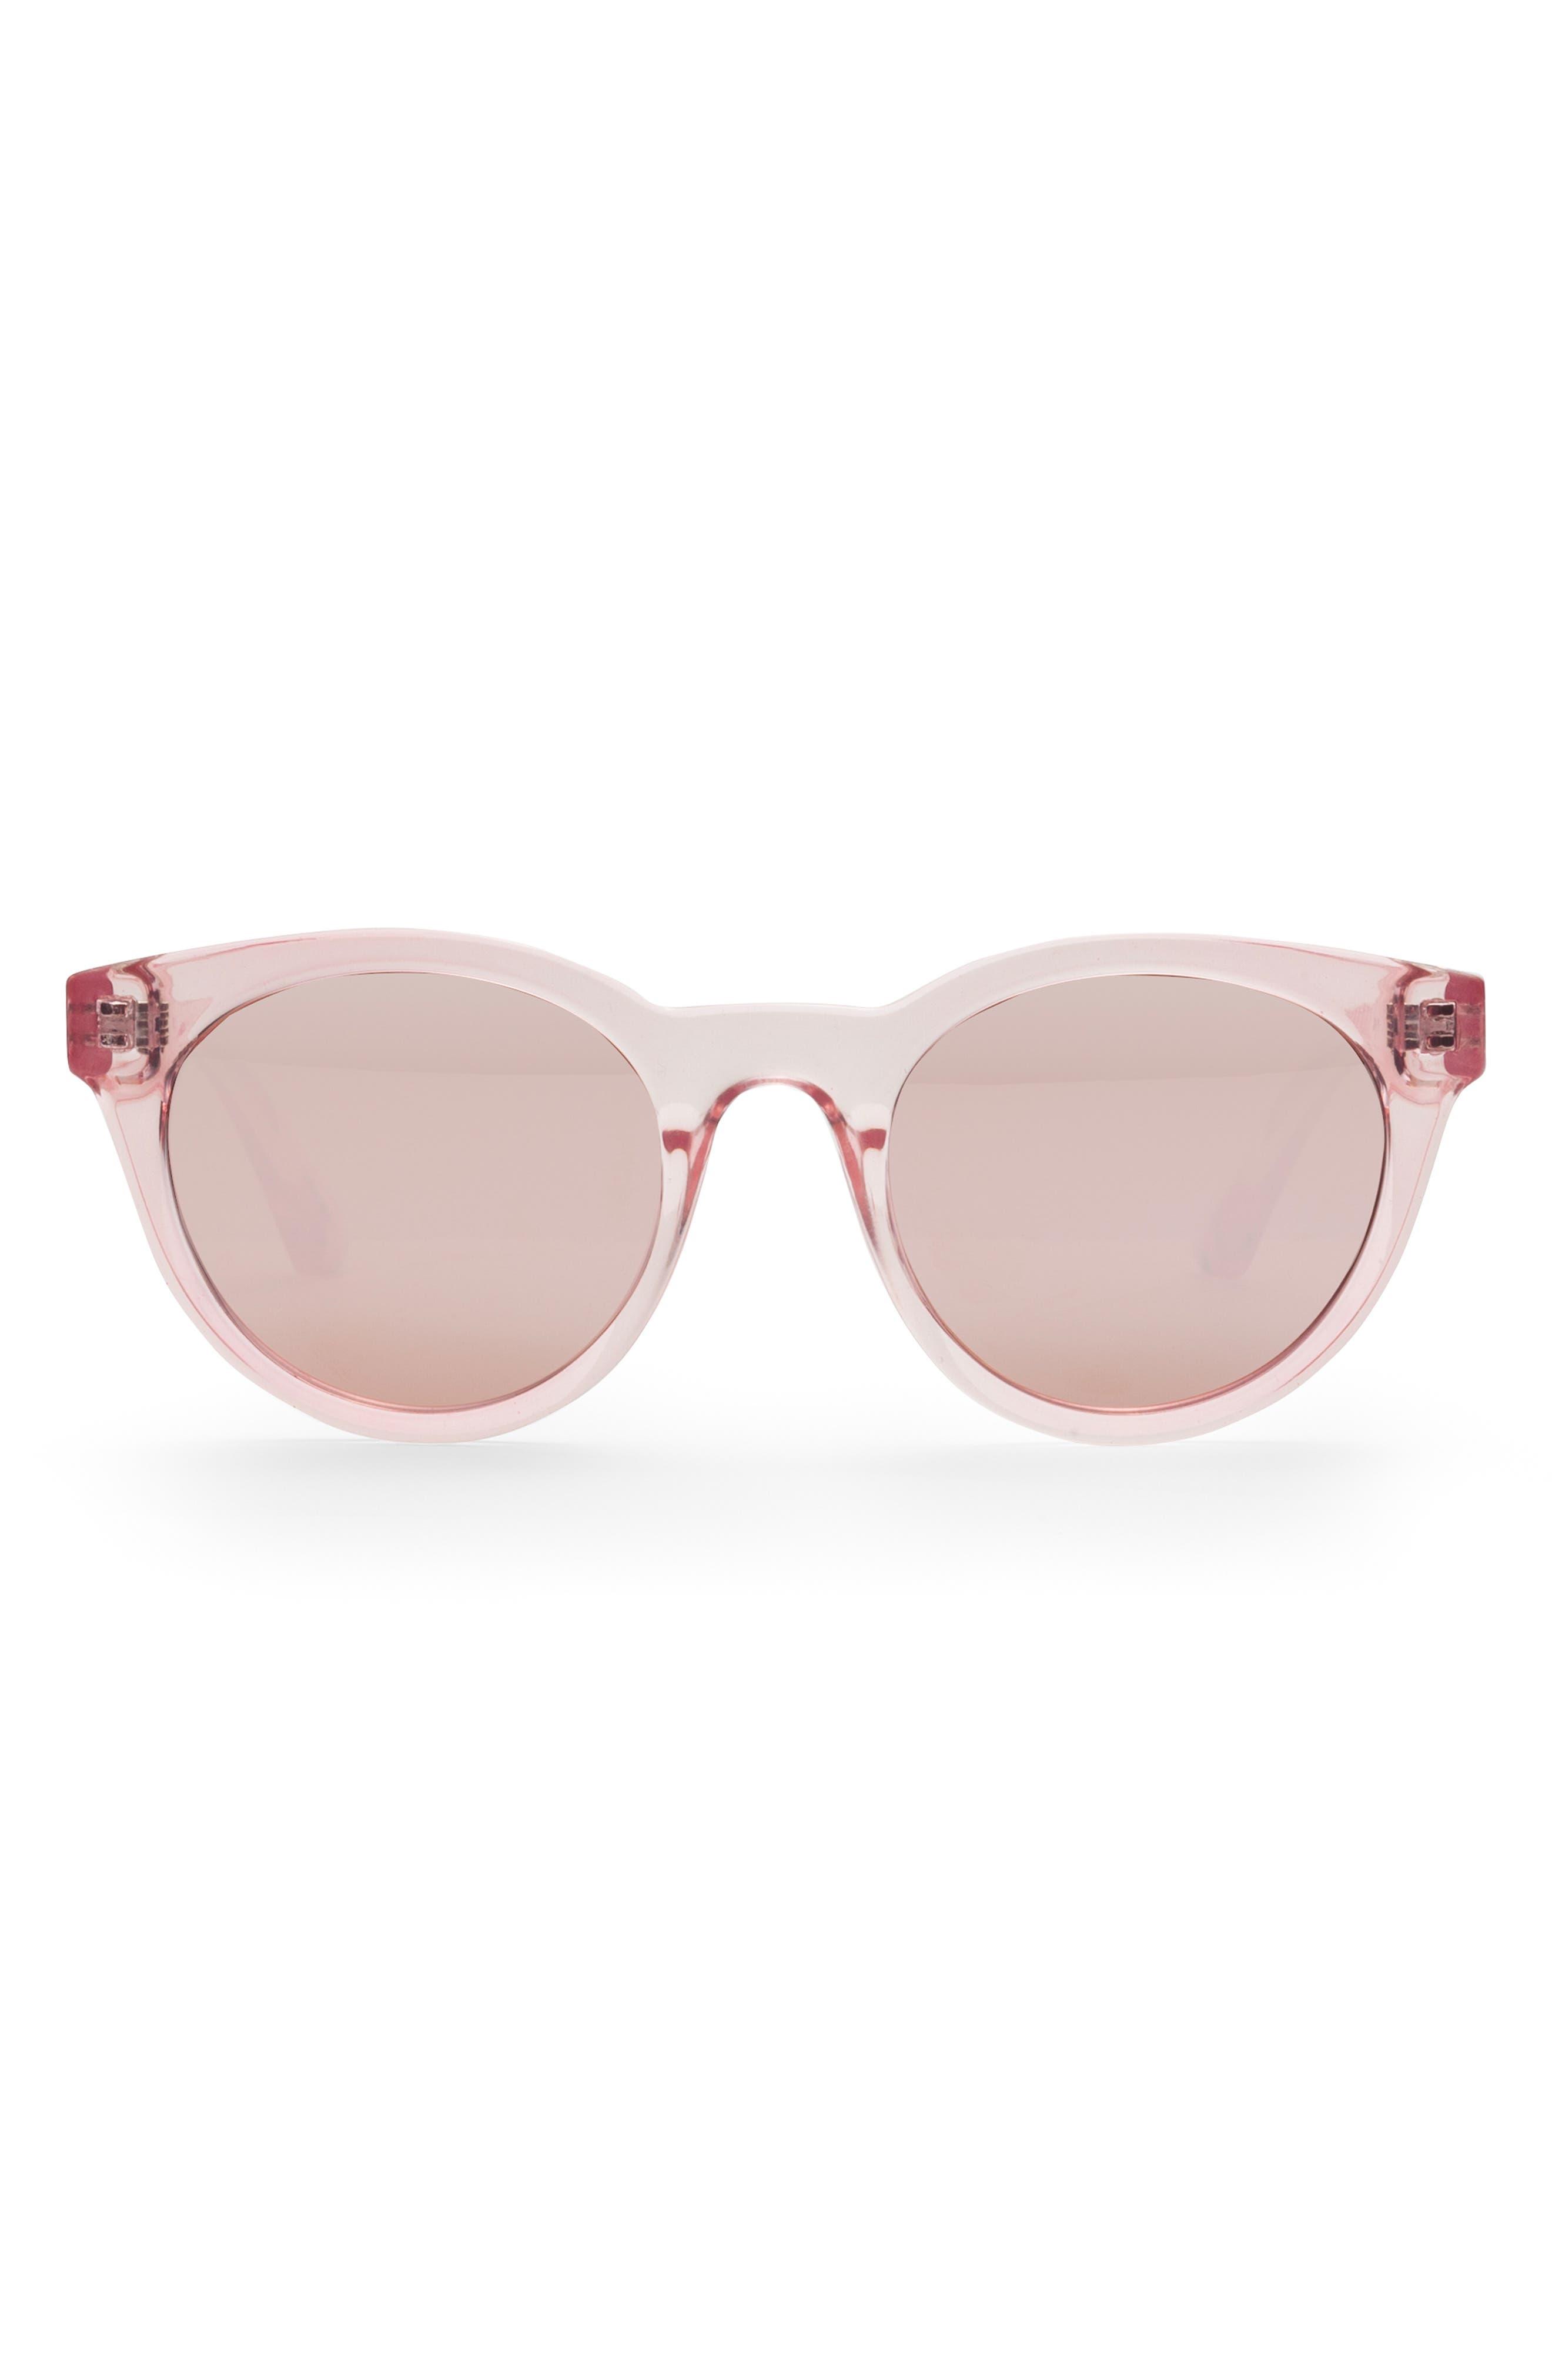 Junia Fizz Preppy 4m Round Sunglasses - Crystal Pink